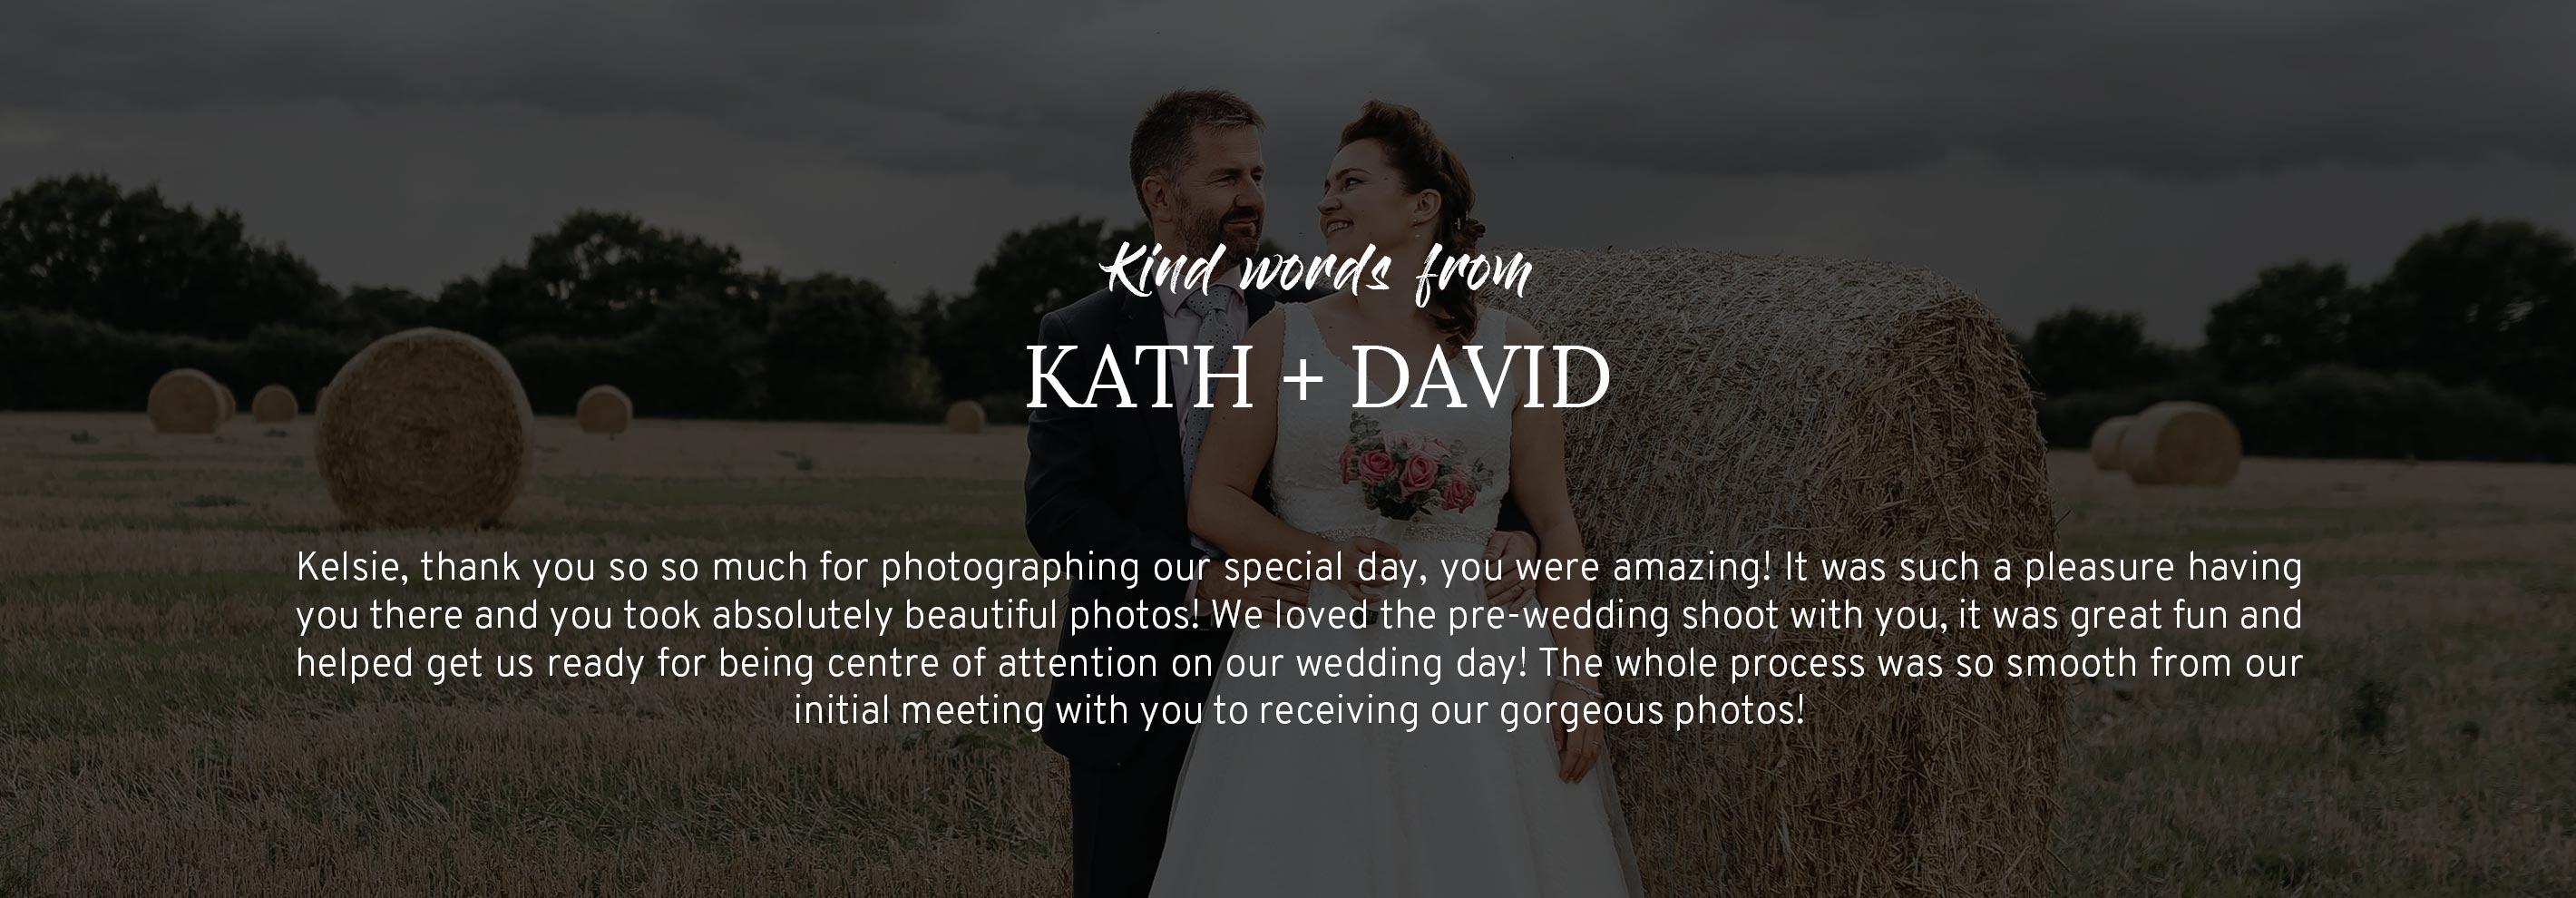 essex-weddings-photographer-testimonials